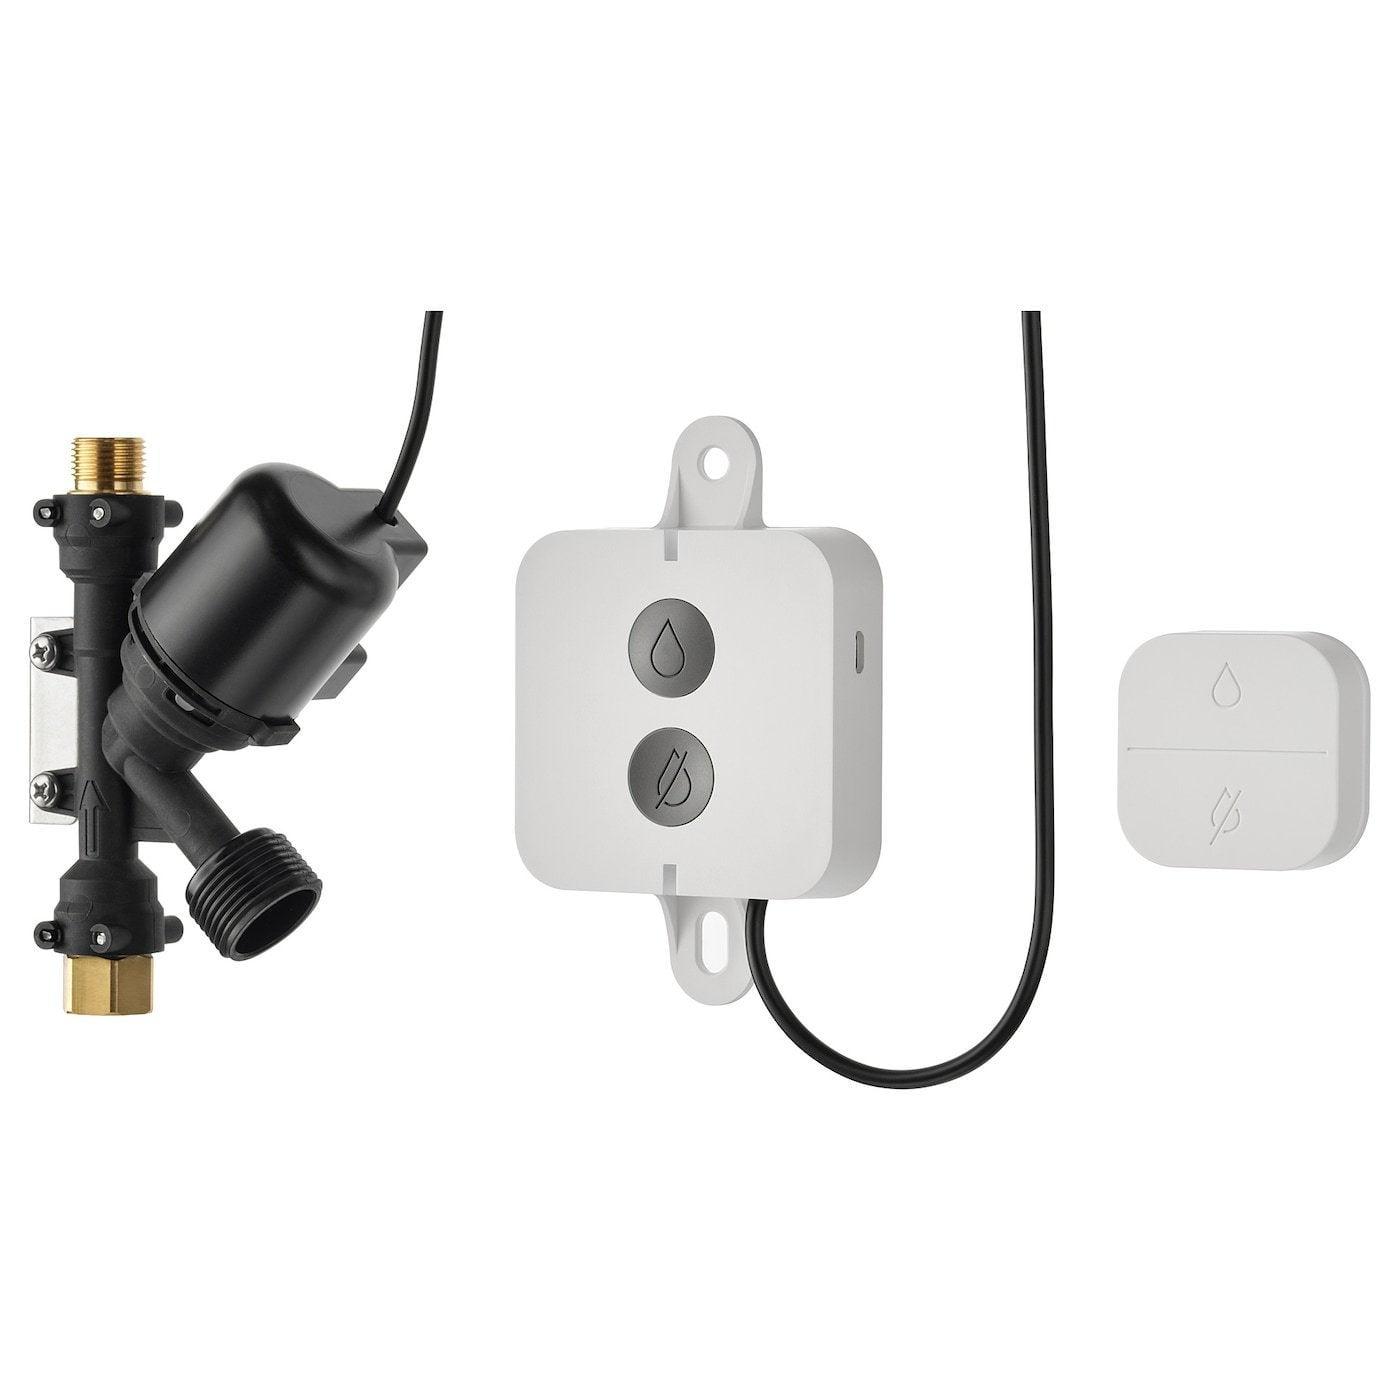 Upcoming HomeKit compatible water shut off valve